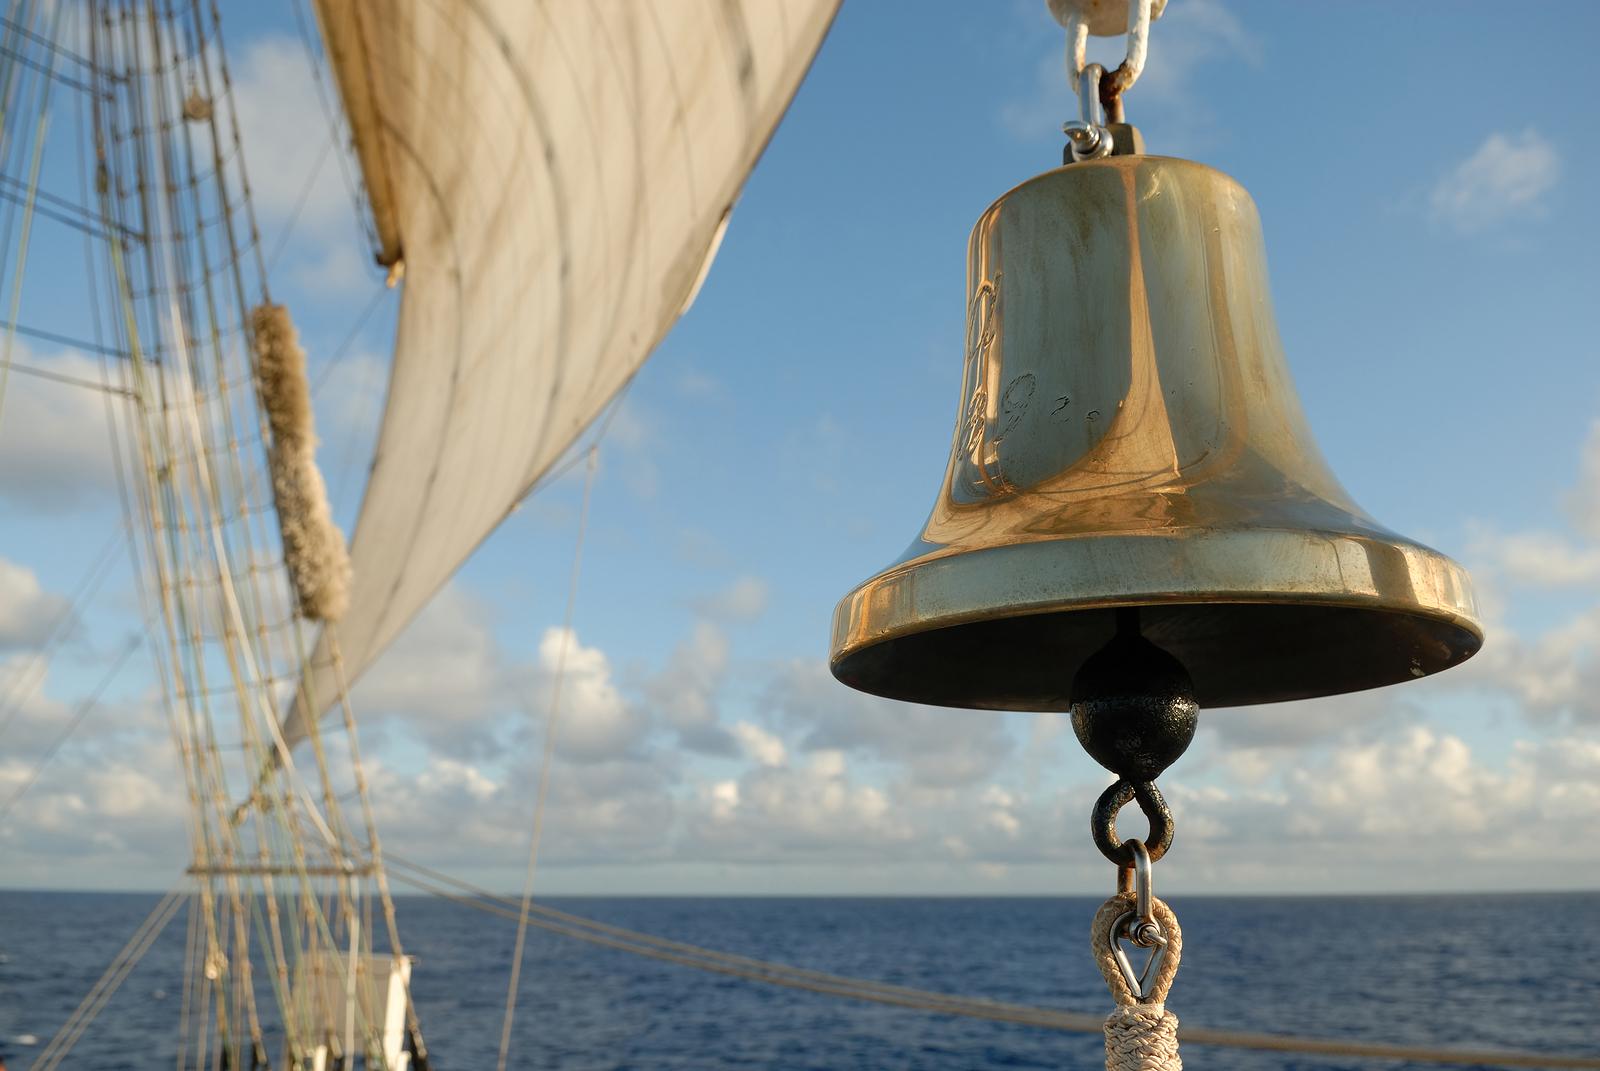 Port of Call bigstock-bell-sailing-ship-37473574.jpg